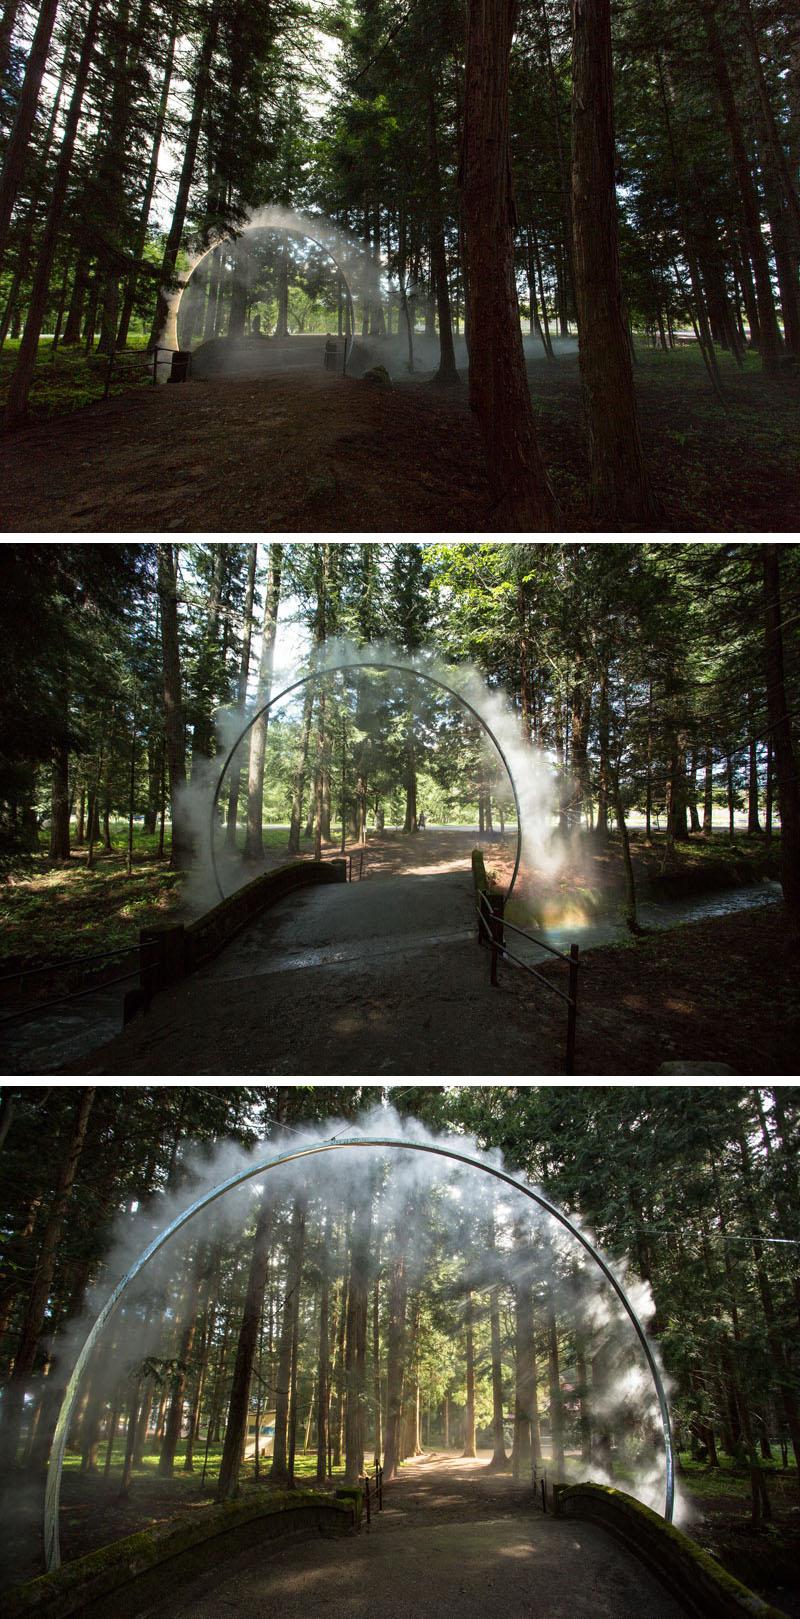 A Sculptural Arch of Mist by James Tapscott in Omachi, Japan